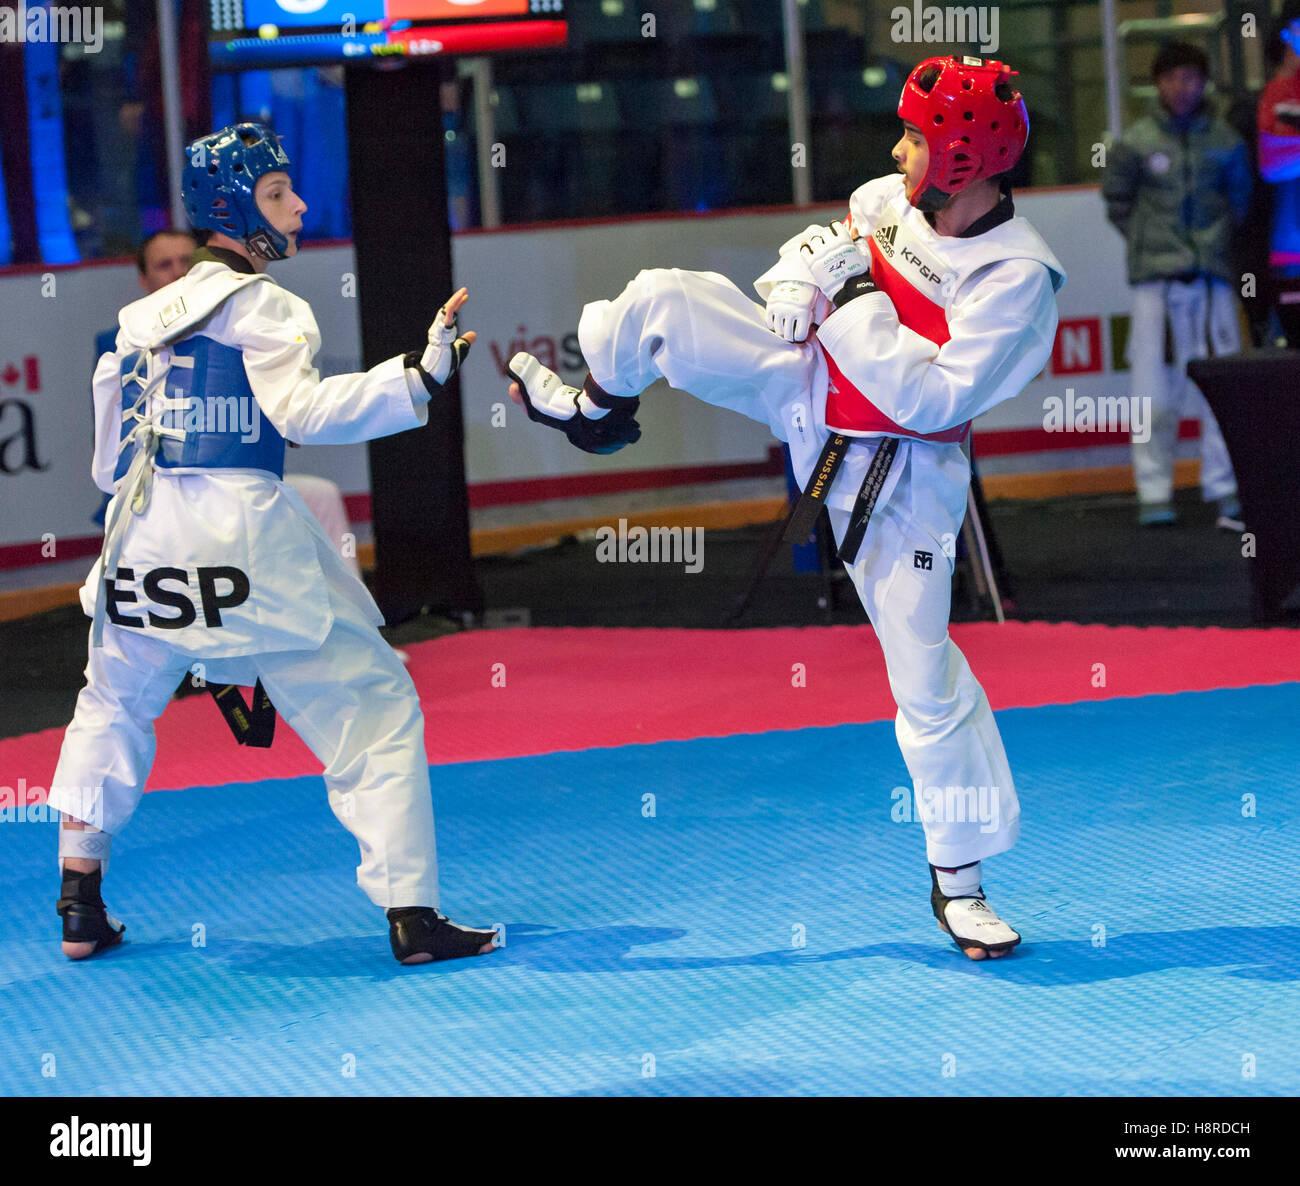 Burnaby, Canada. 16th Nov, 2016. WTF World Taekwondo Junior Championships, Alan Arcal Alcazar (ESP) in blue and - Stock Image